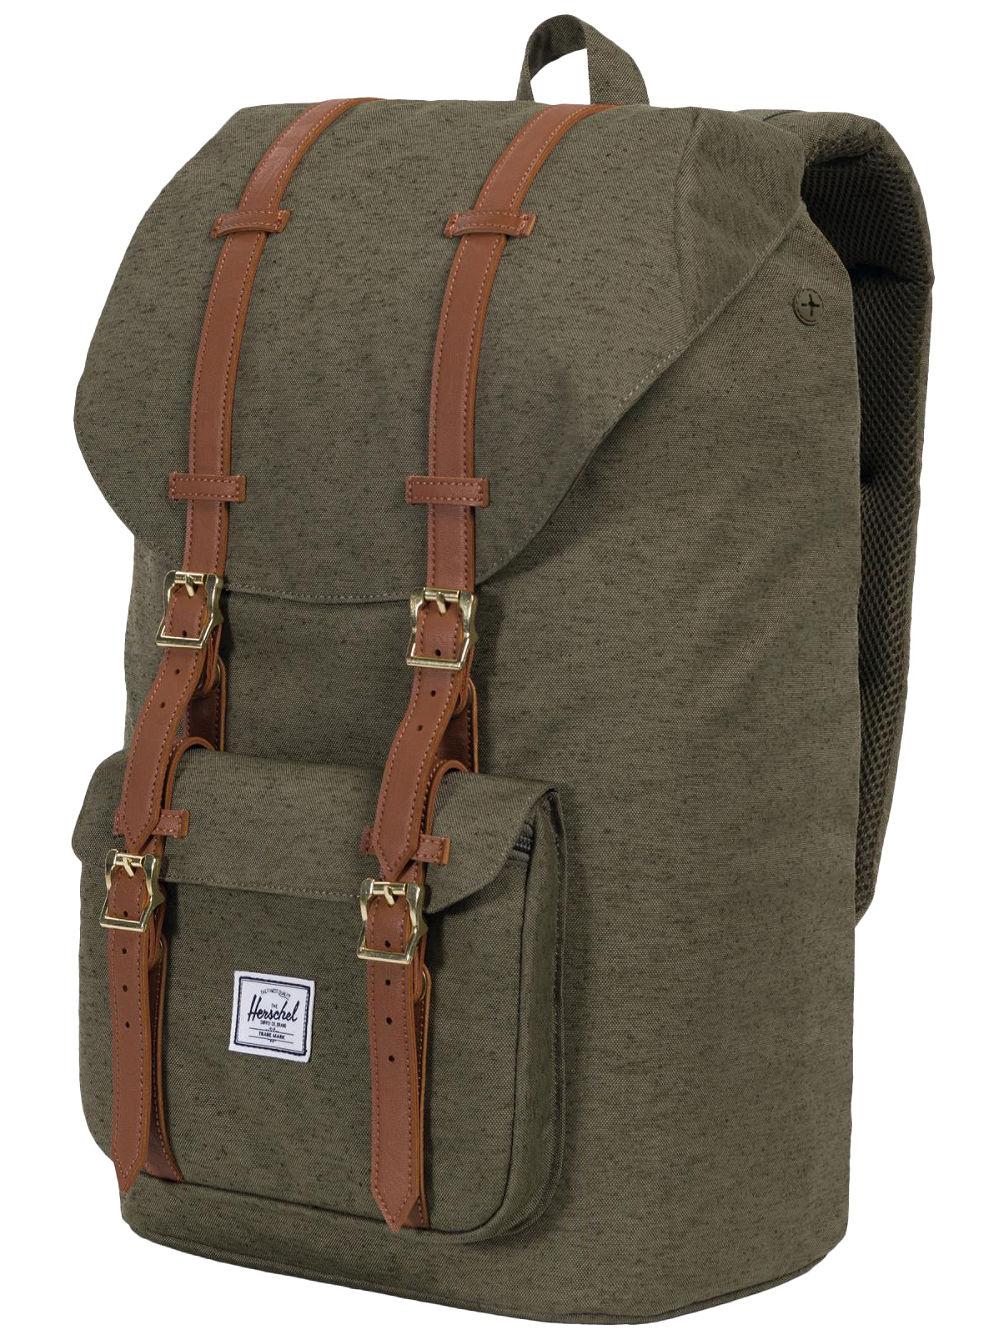 741bd340806 Buy Herschel Little America Backpack online at Blue Tomato